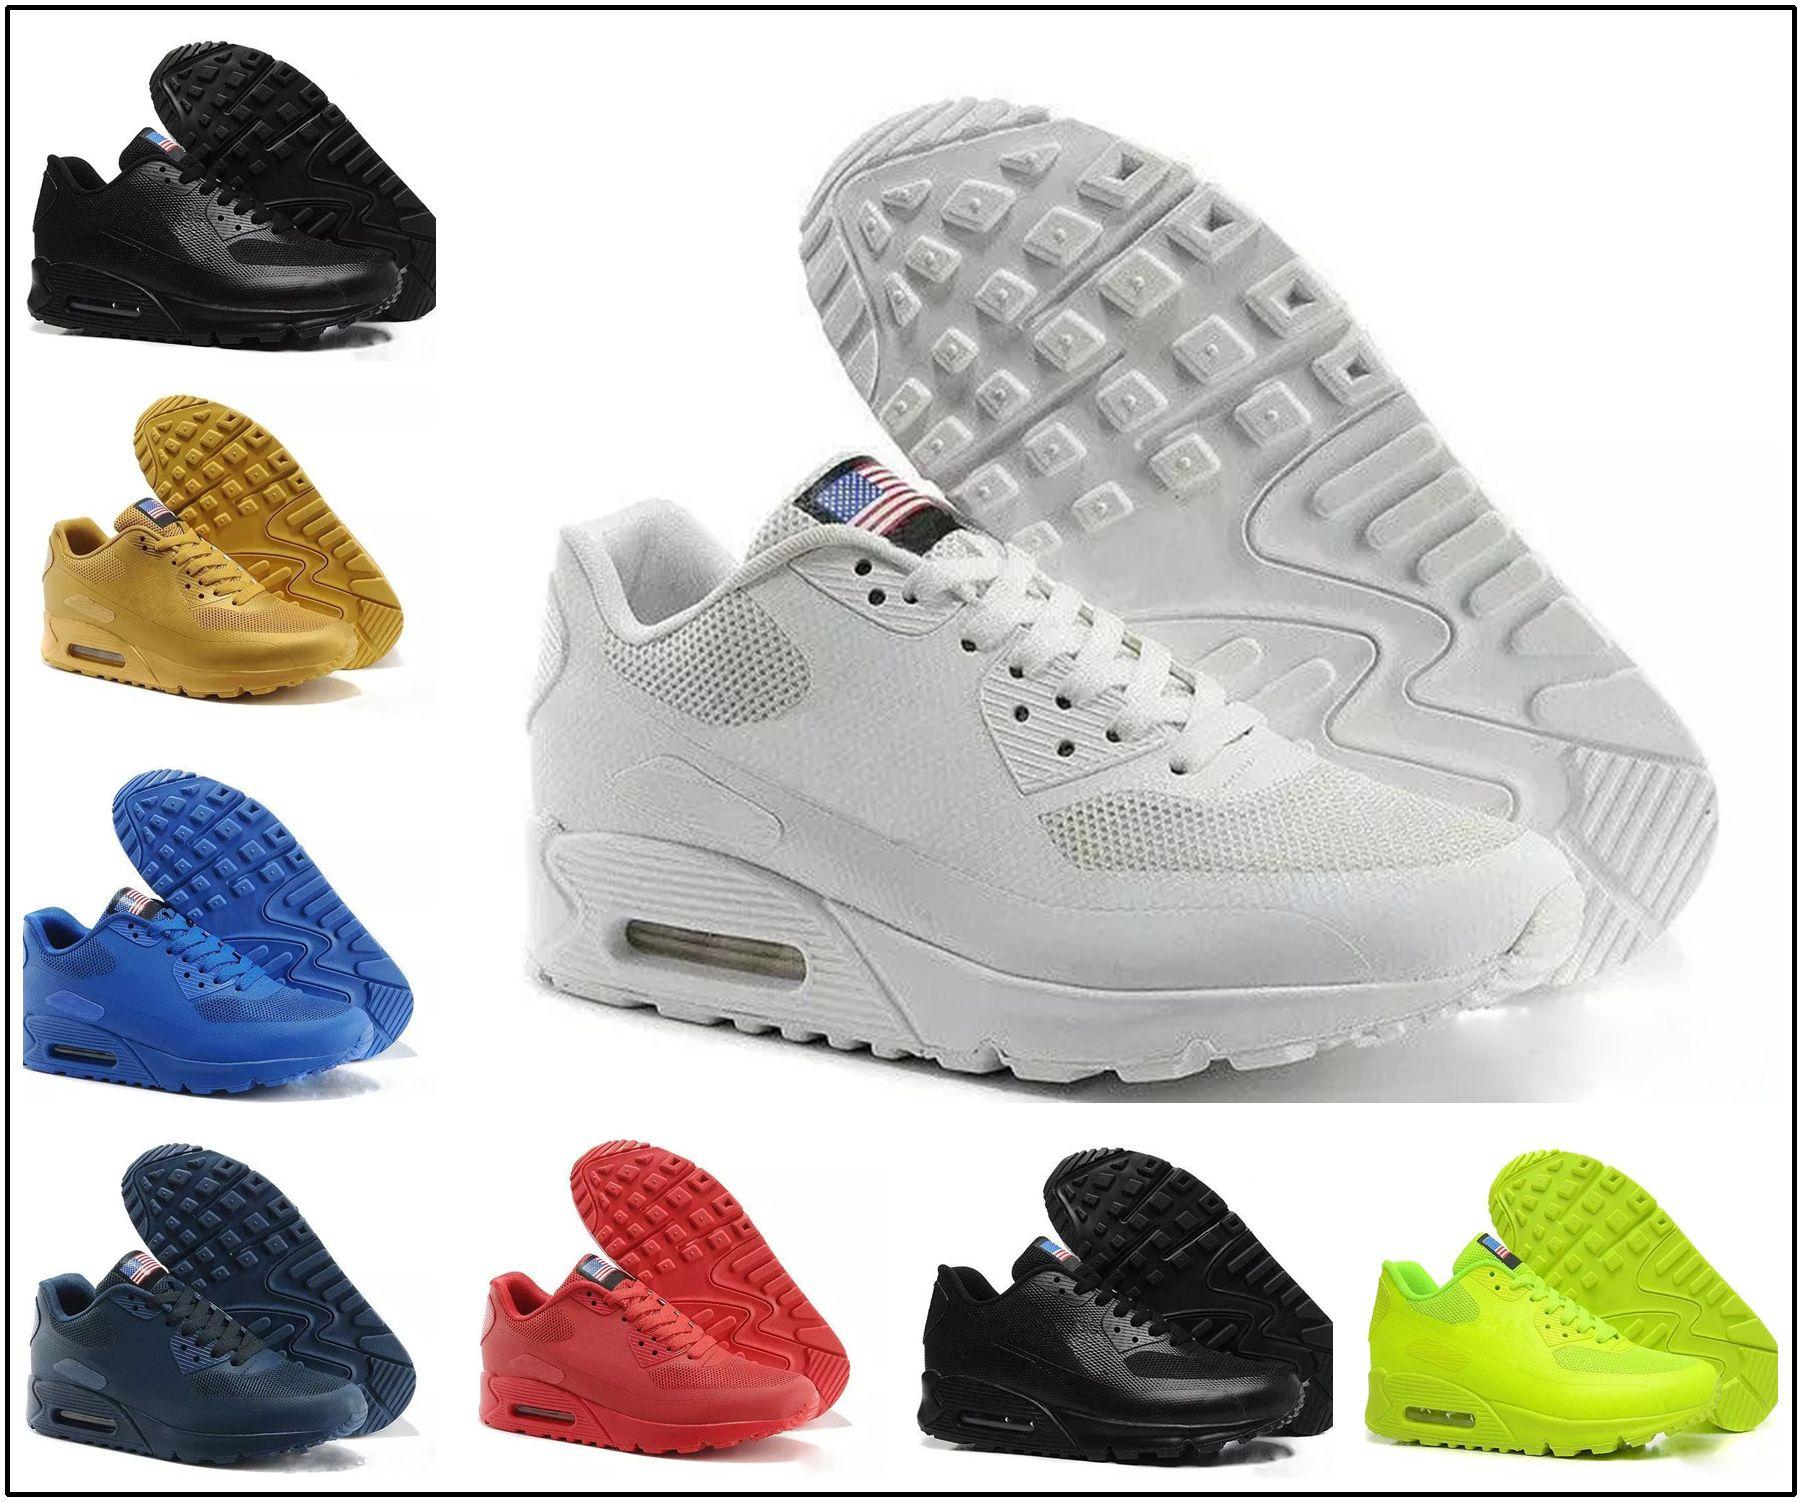 timeless design 5489f 3f4d2 Compre Nike Air Max 90 HYP PRM QS 2018 NUEVOS 90 HY PRM QS Hombres Mujeres Zapatos  Para Correr 90s HyperS Fusible American Flag Negro Blanco Azul Marino Oro  ...